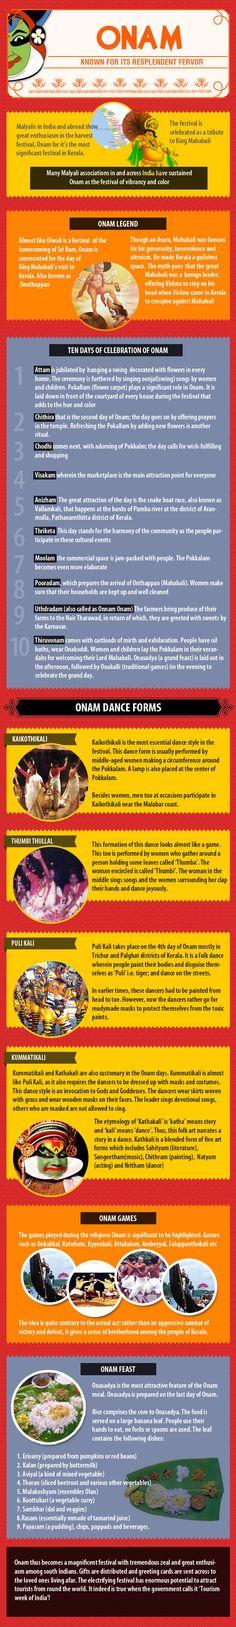 Celebrating Onam the Harvest festival of Kerala, India - This Hindu festival is famous for Bahubali, pookolams, boat racing , onam sadya & elephants. Come Explore India with us